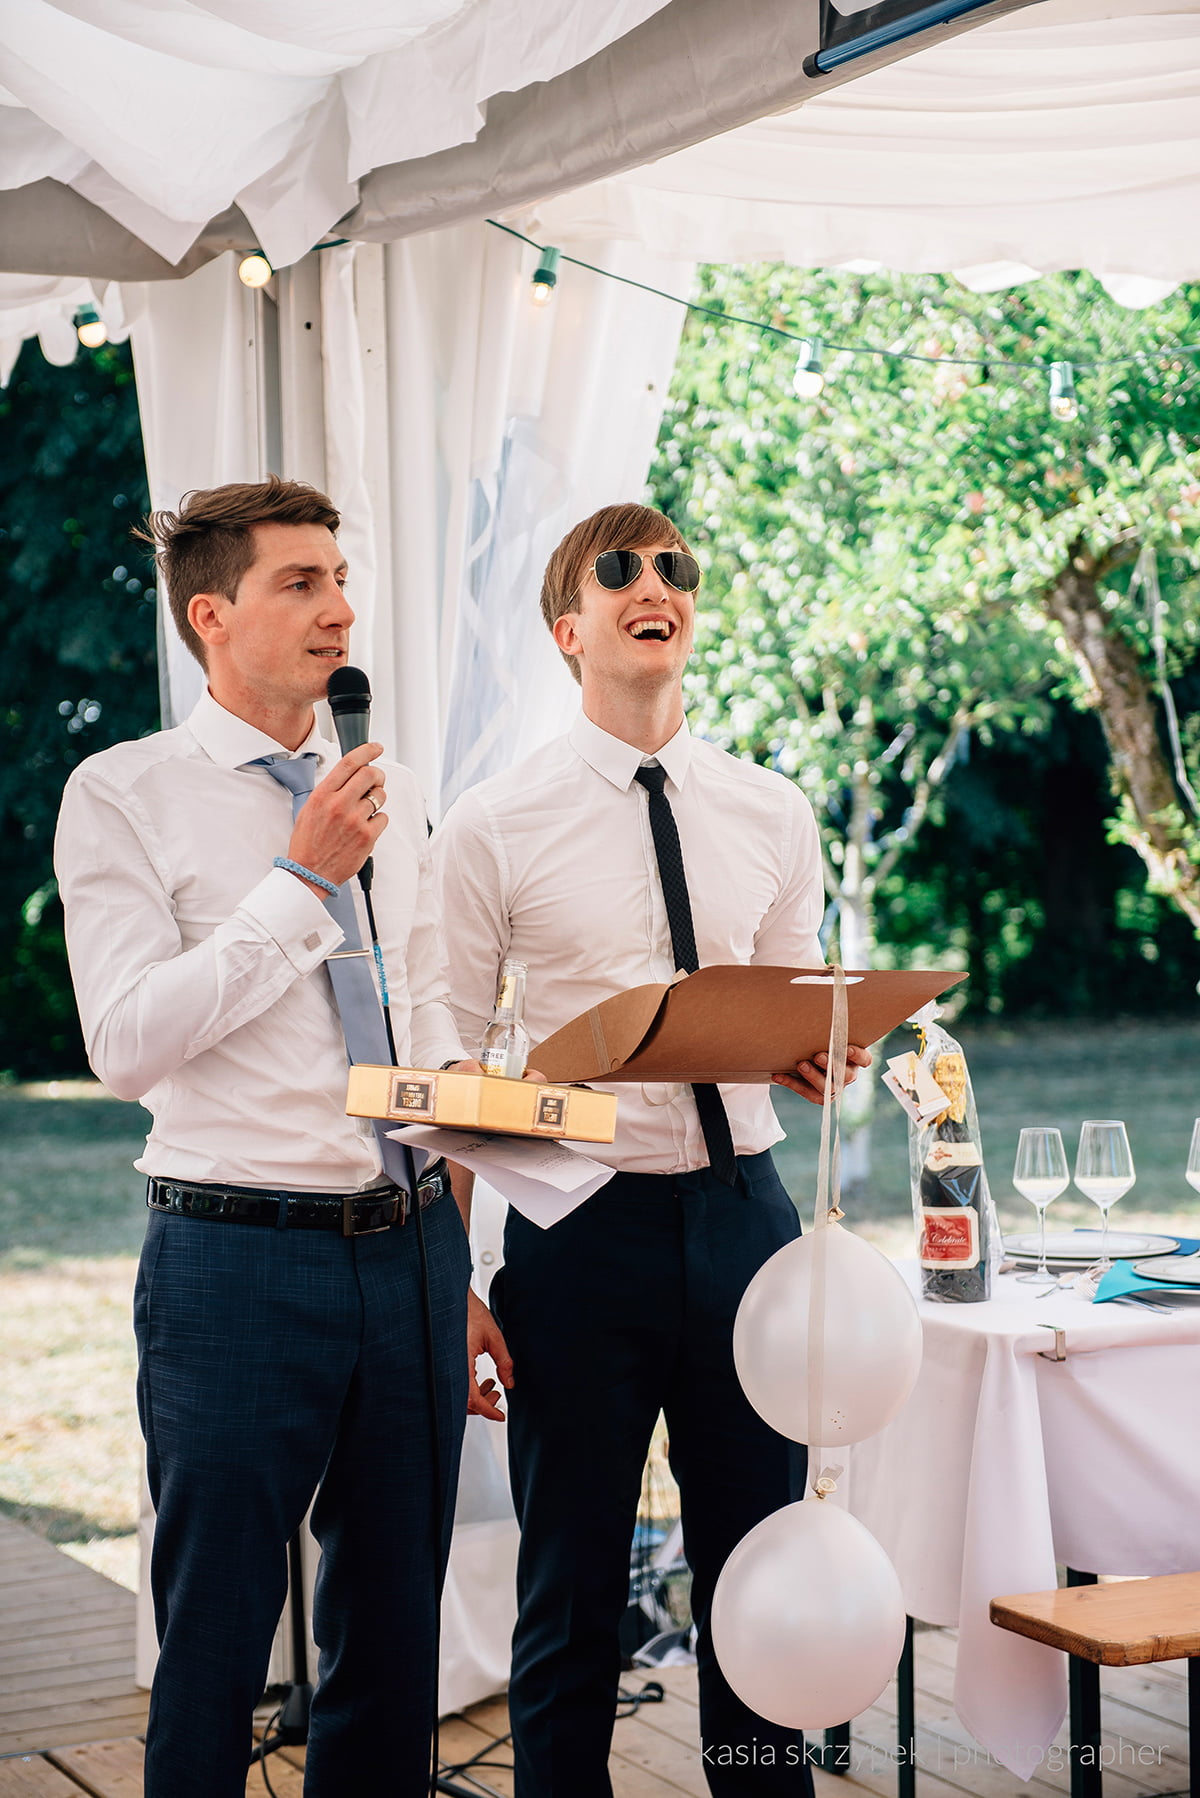 Kasia-Bacq-Destination-Wedding-France-Day-2---Karel-&-Frederik-068